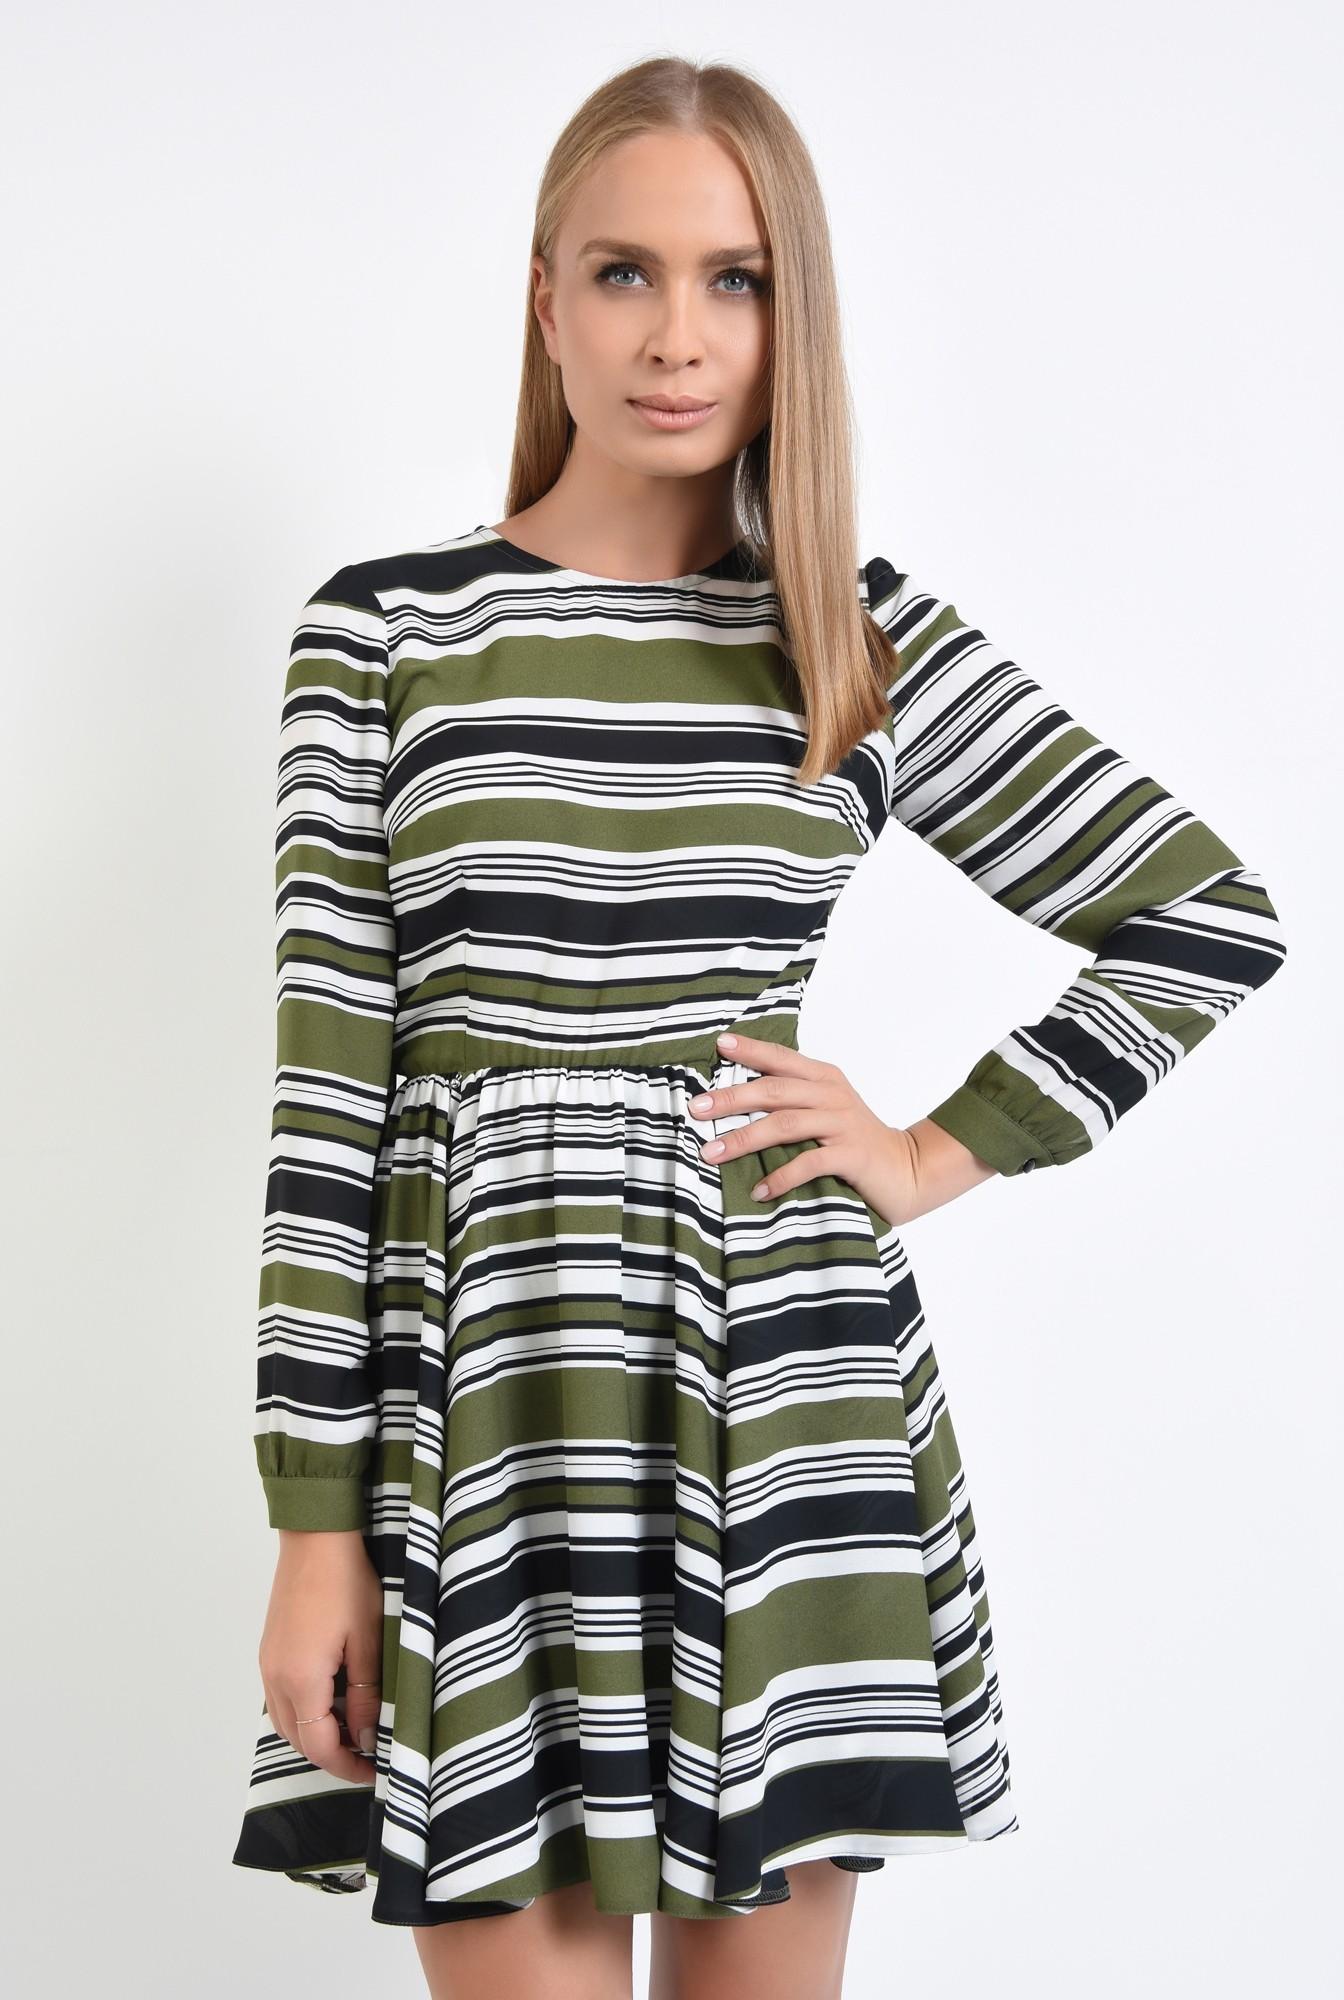 2 - rochie casual, talie pe elastic, decolteu rotund la baza gatului, rochii online